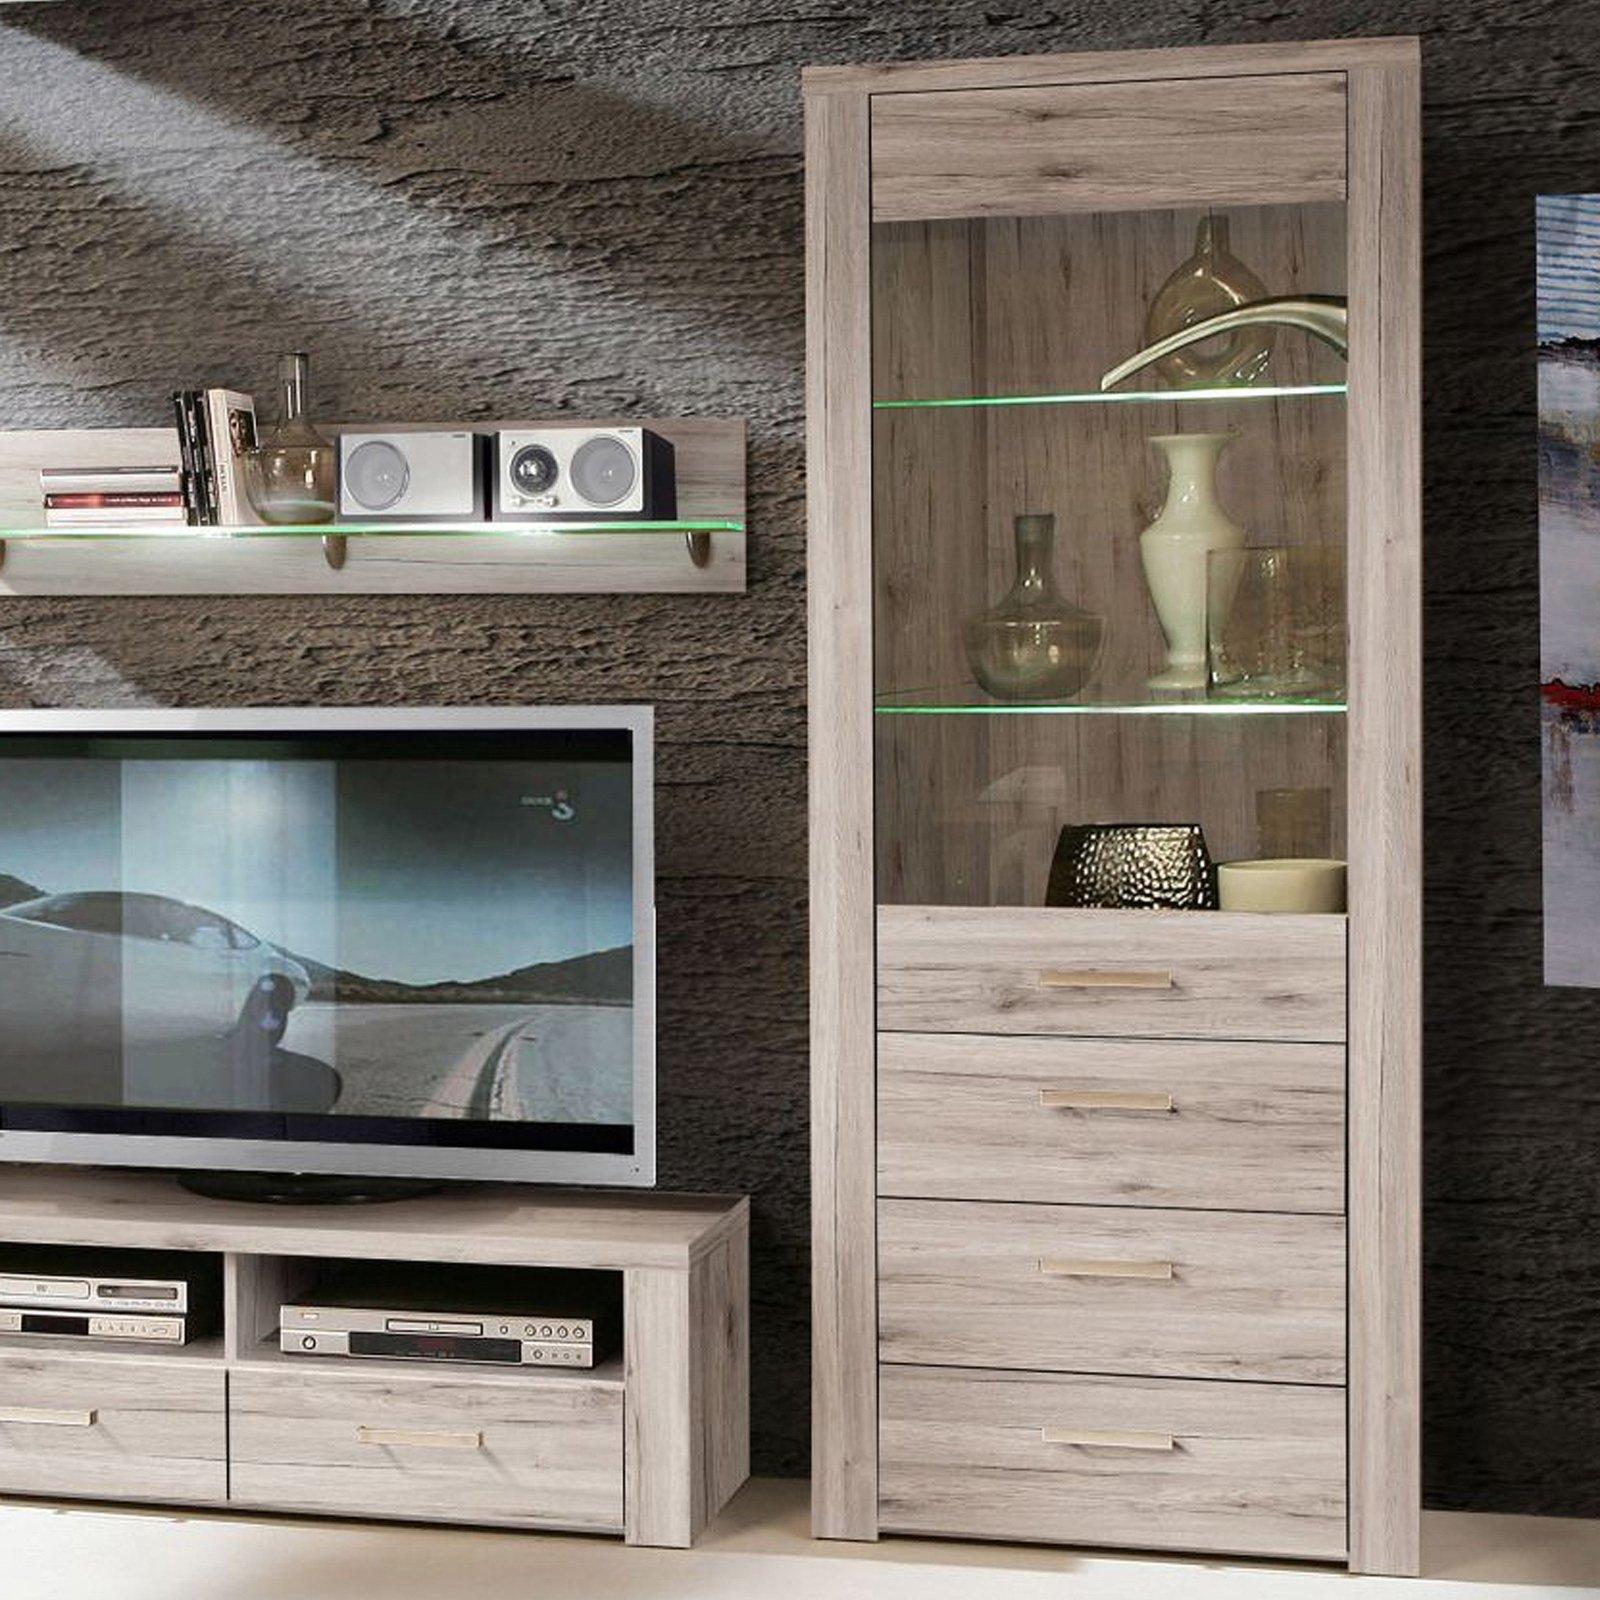 vitrine portland sandeiche mit beleuchtung ebay. Black Bedroom Furniture Sets. Home Design Ideas